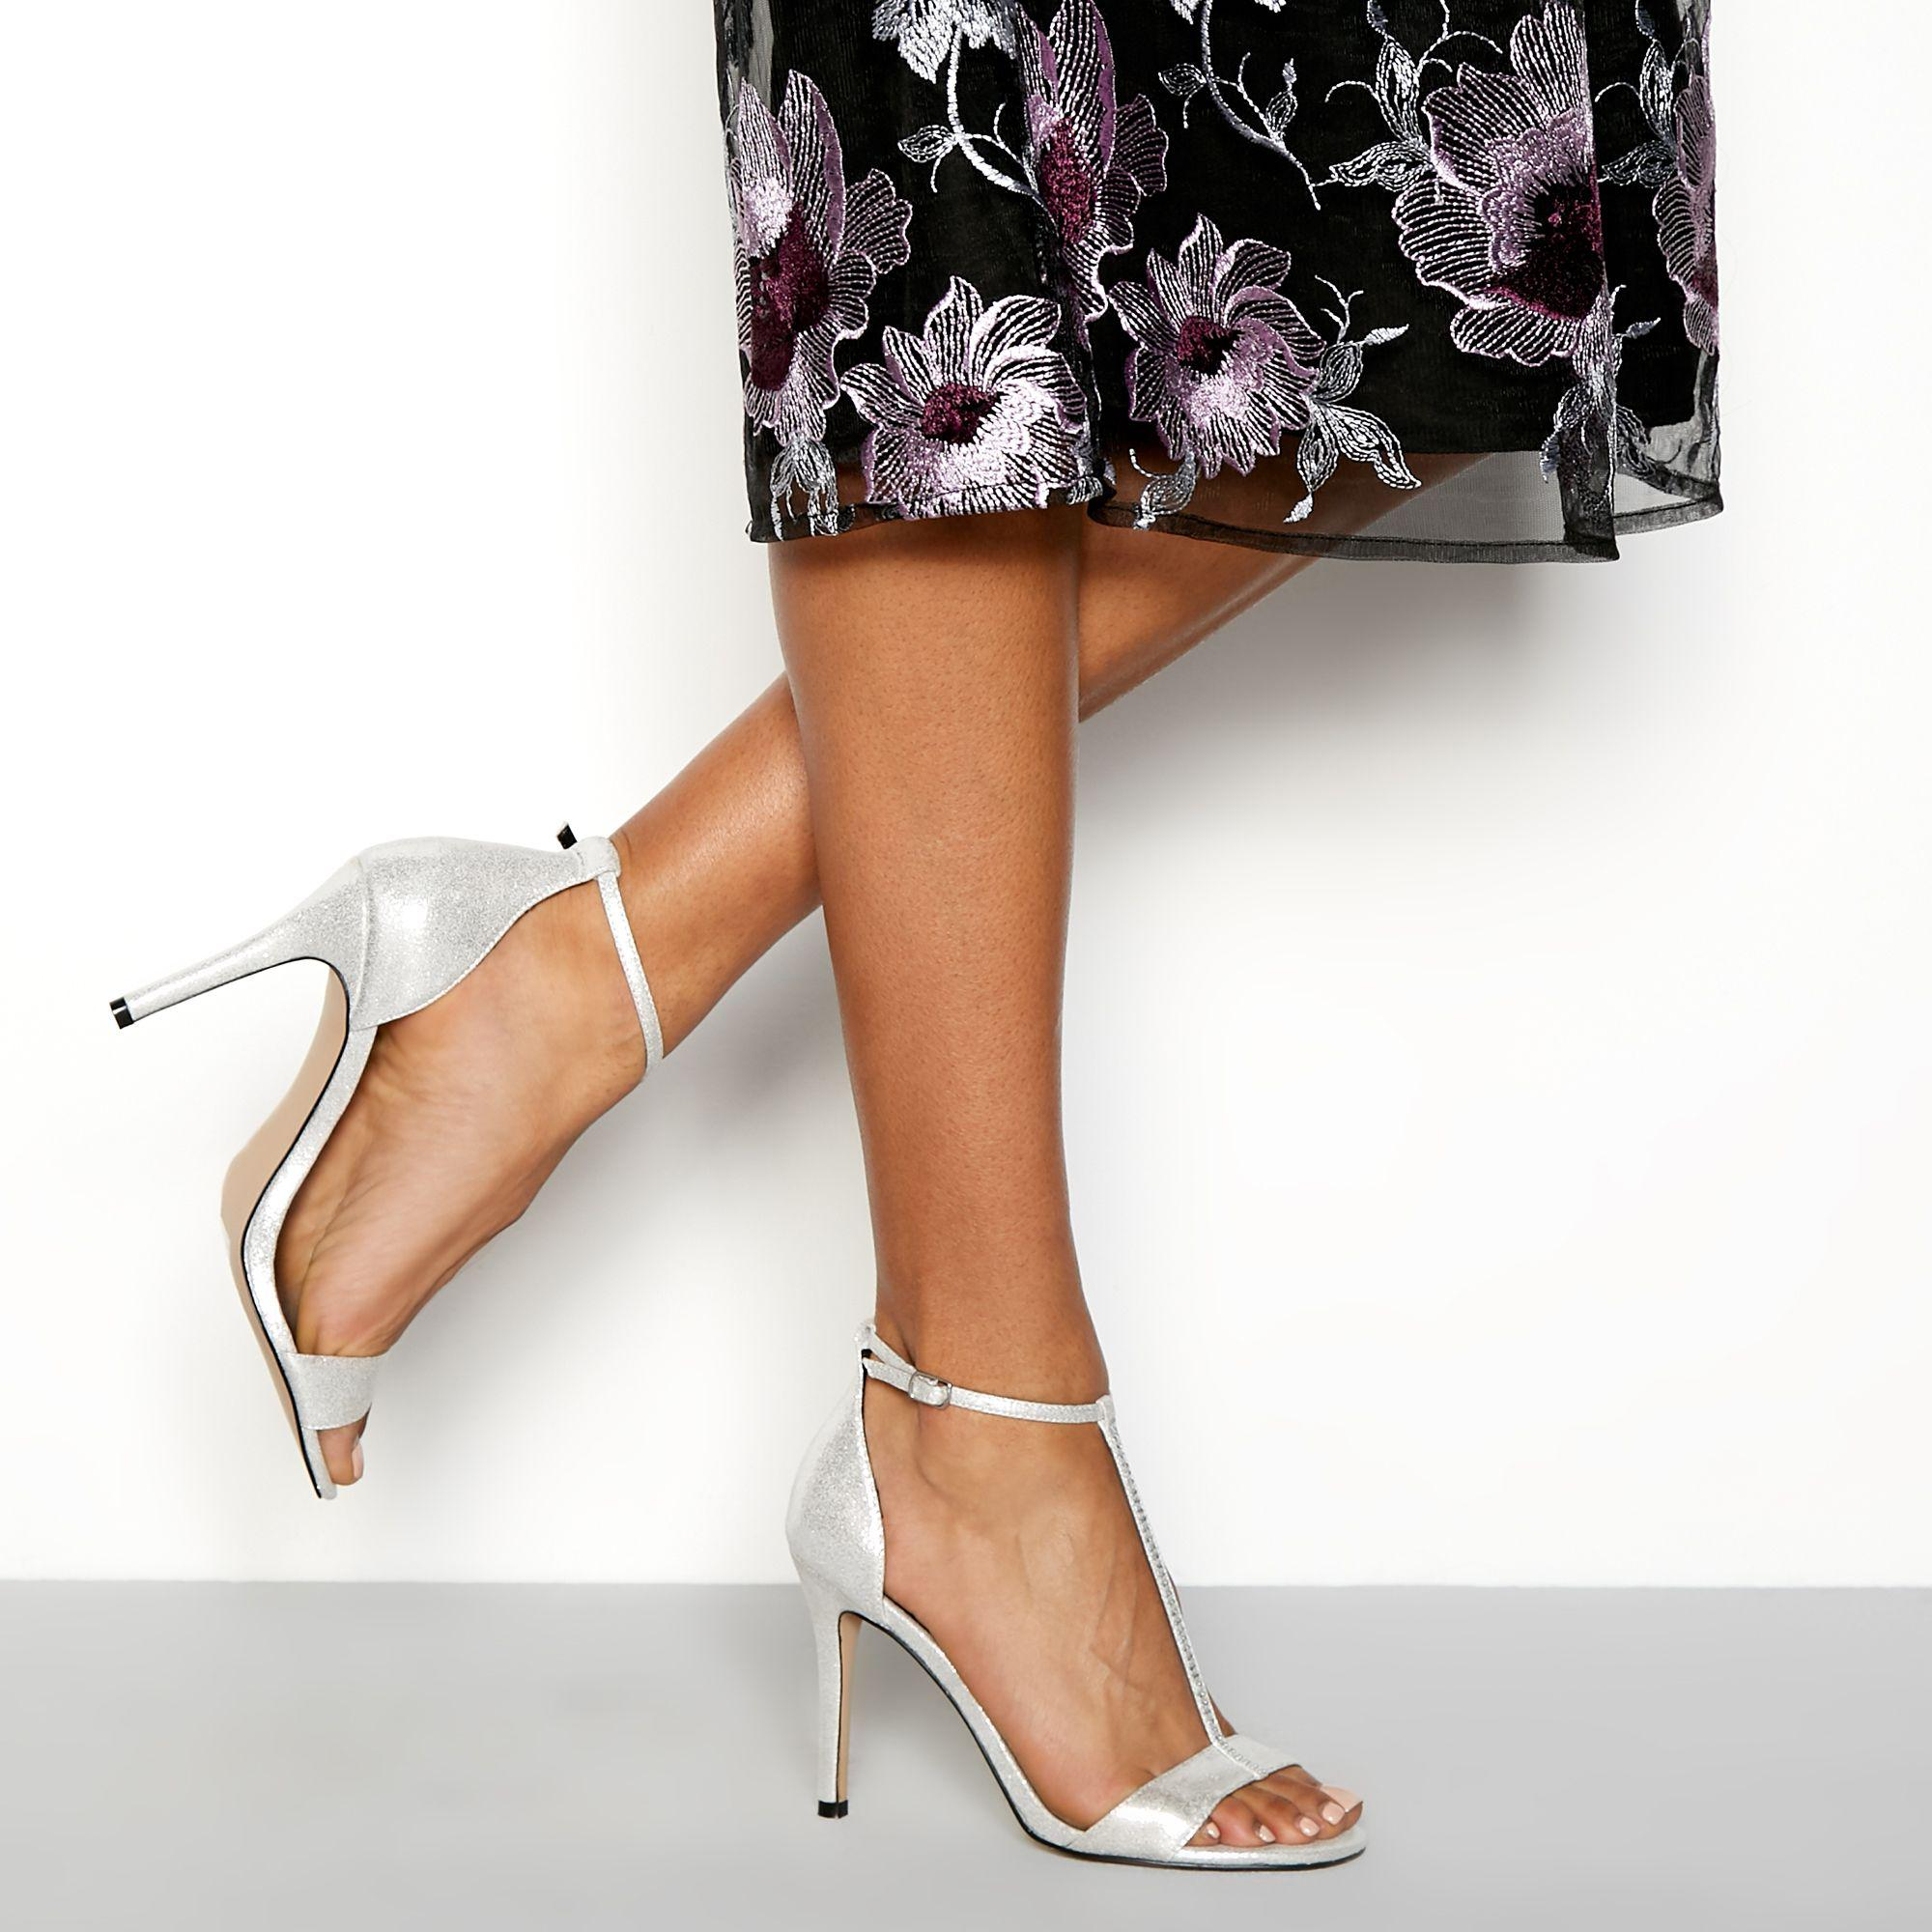 18d463dd80f Faith. Women s Metallic Silver T-bar Sparkle Stiletto High Heels Sandals